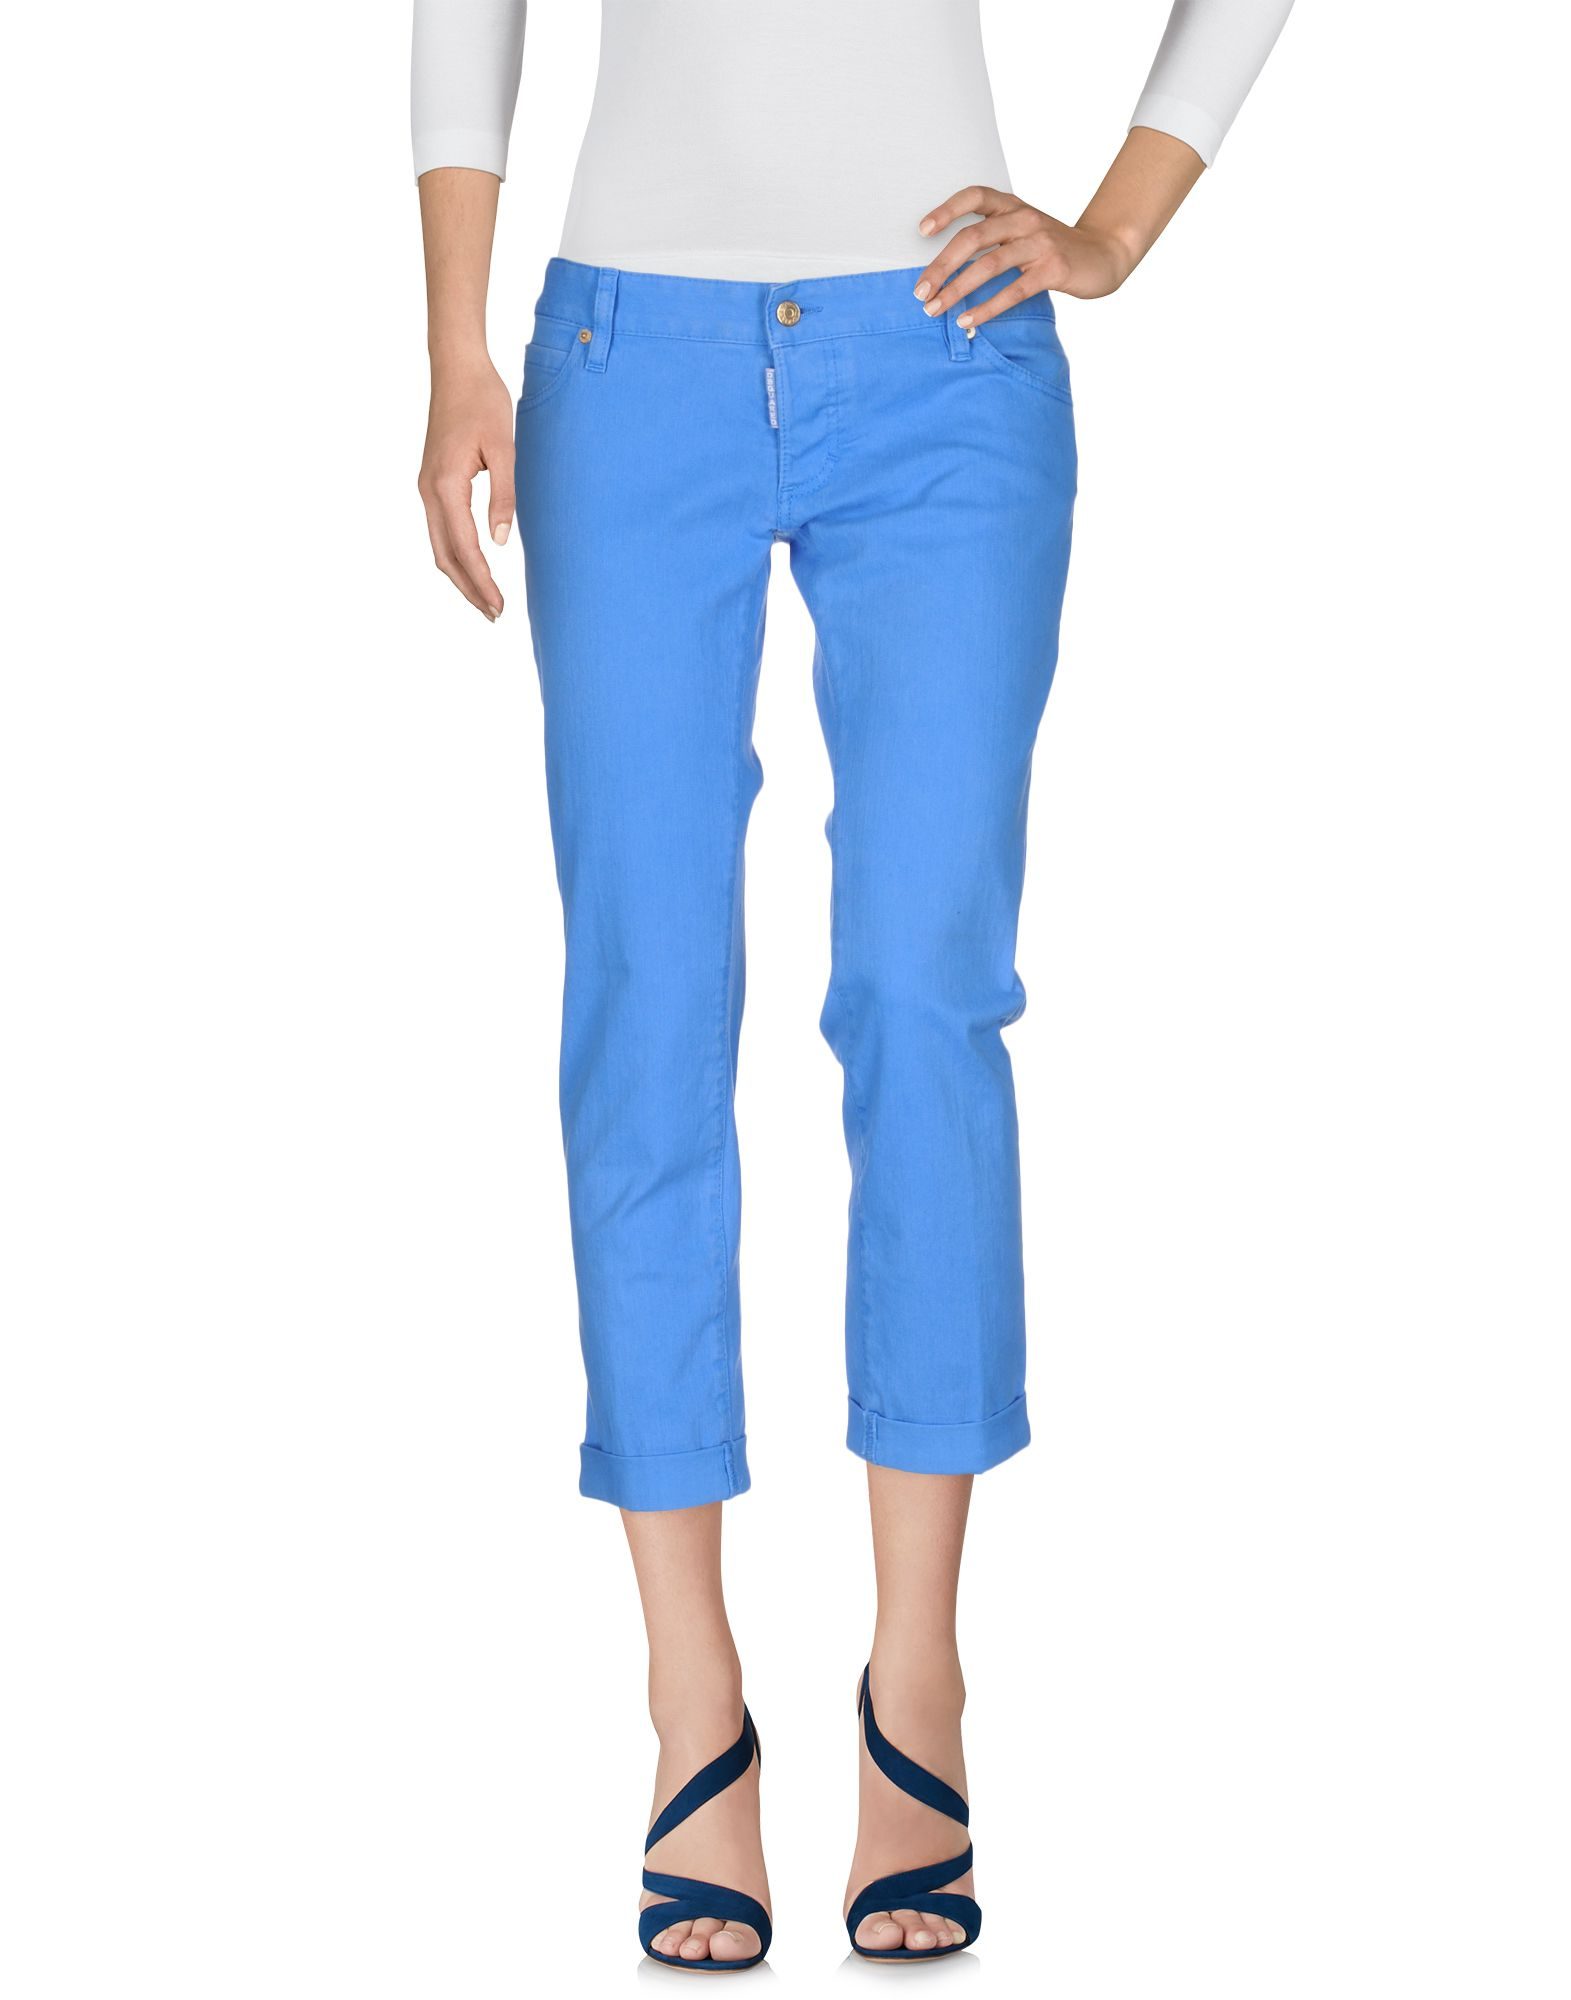 DSQUARED2 Damen Jeanshose Farbe Azurblau Größe 6 jetztbilligerkaufen